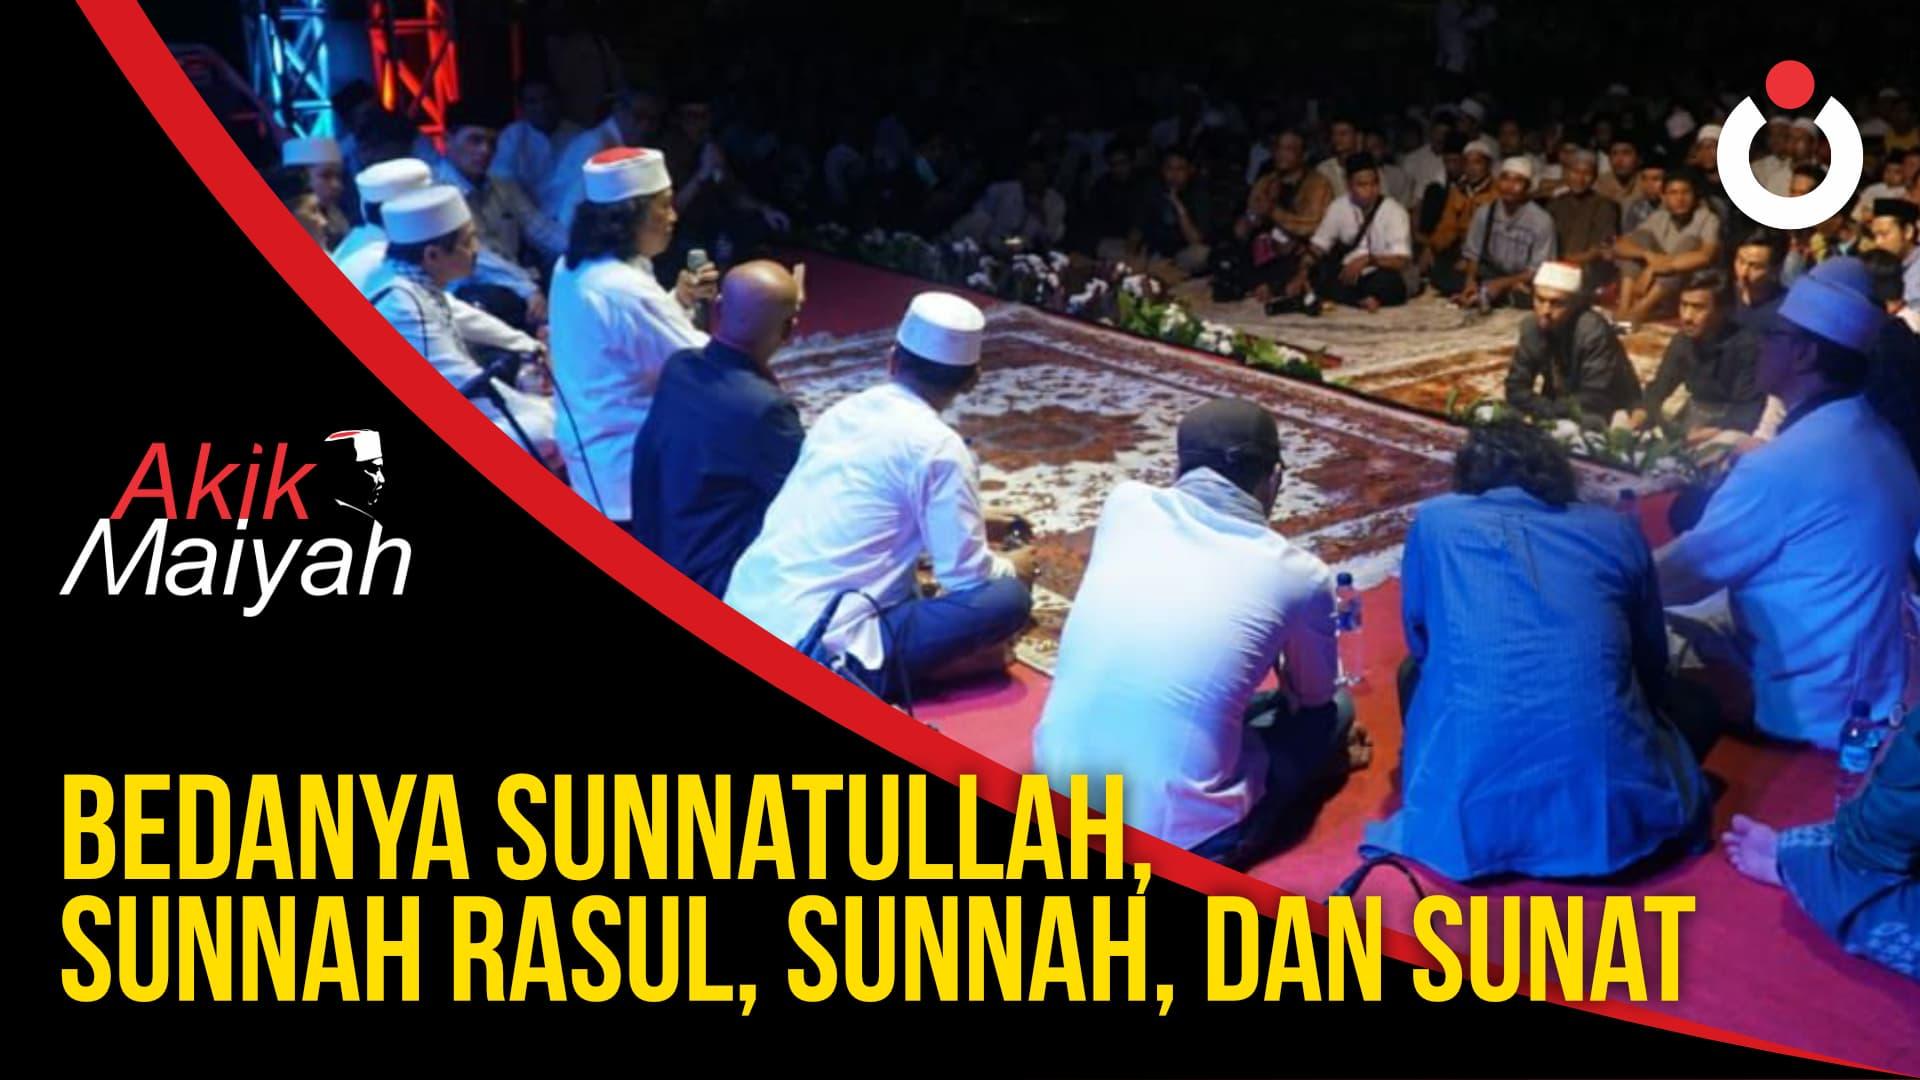 Cak Nun: Bedanya Sunnatullah, Sunnah Rasul, Sunnah, Sunat